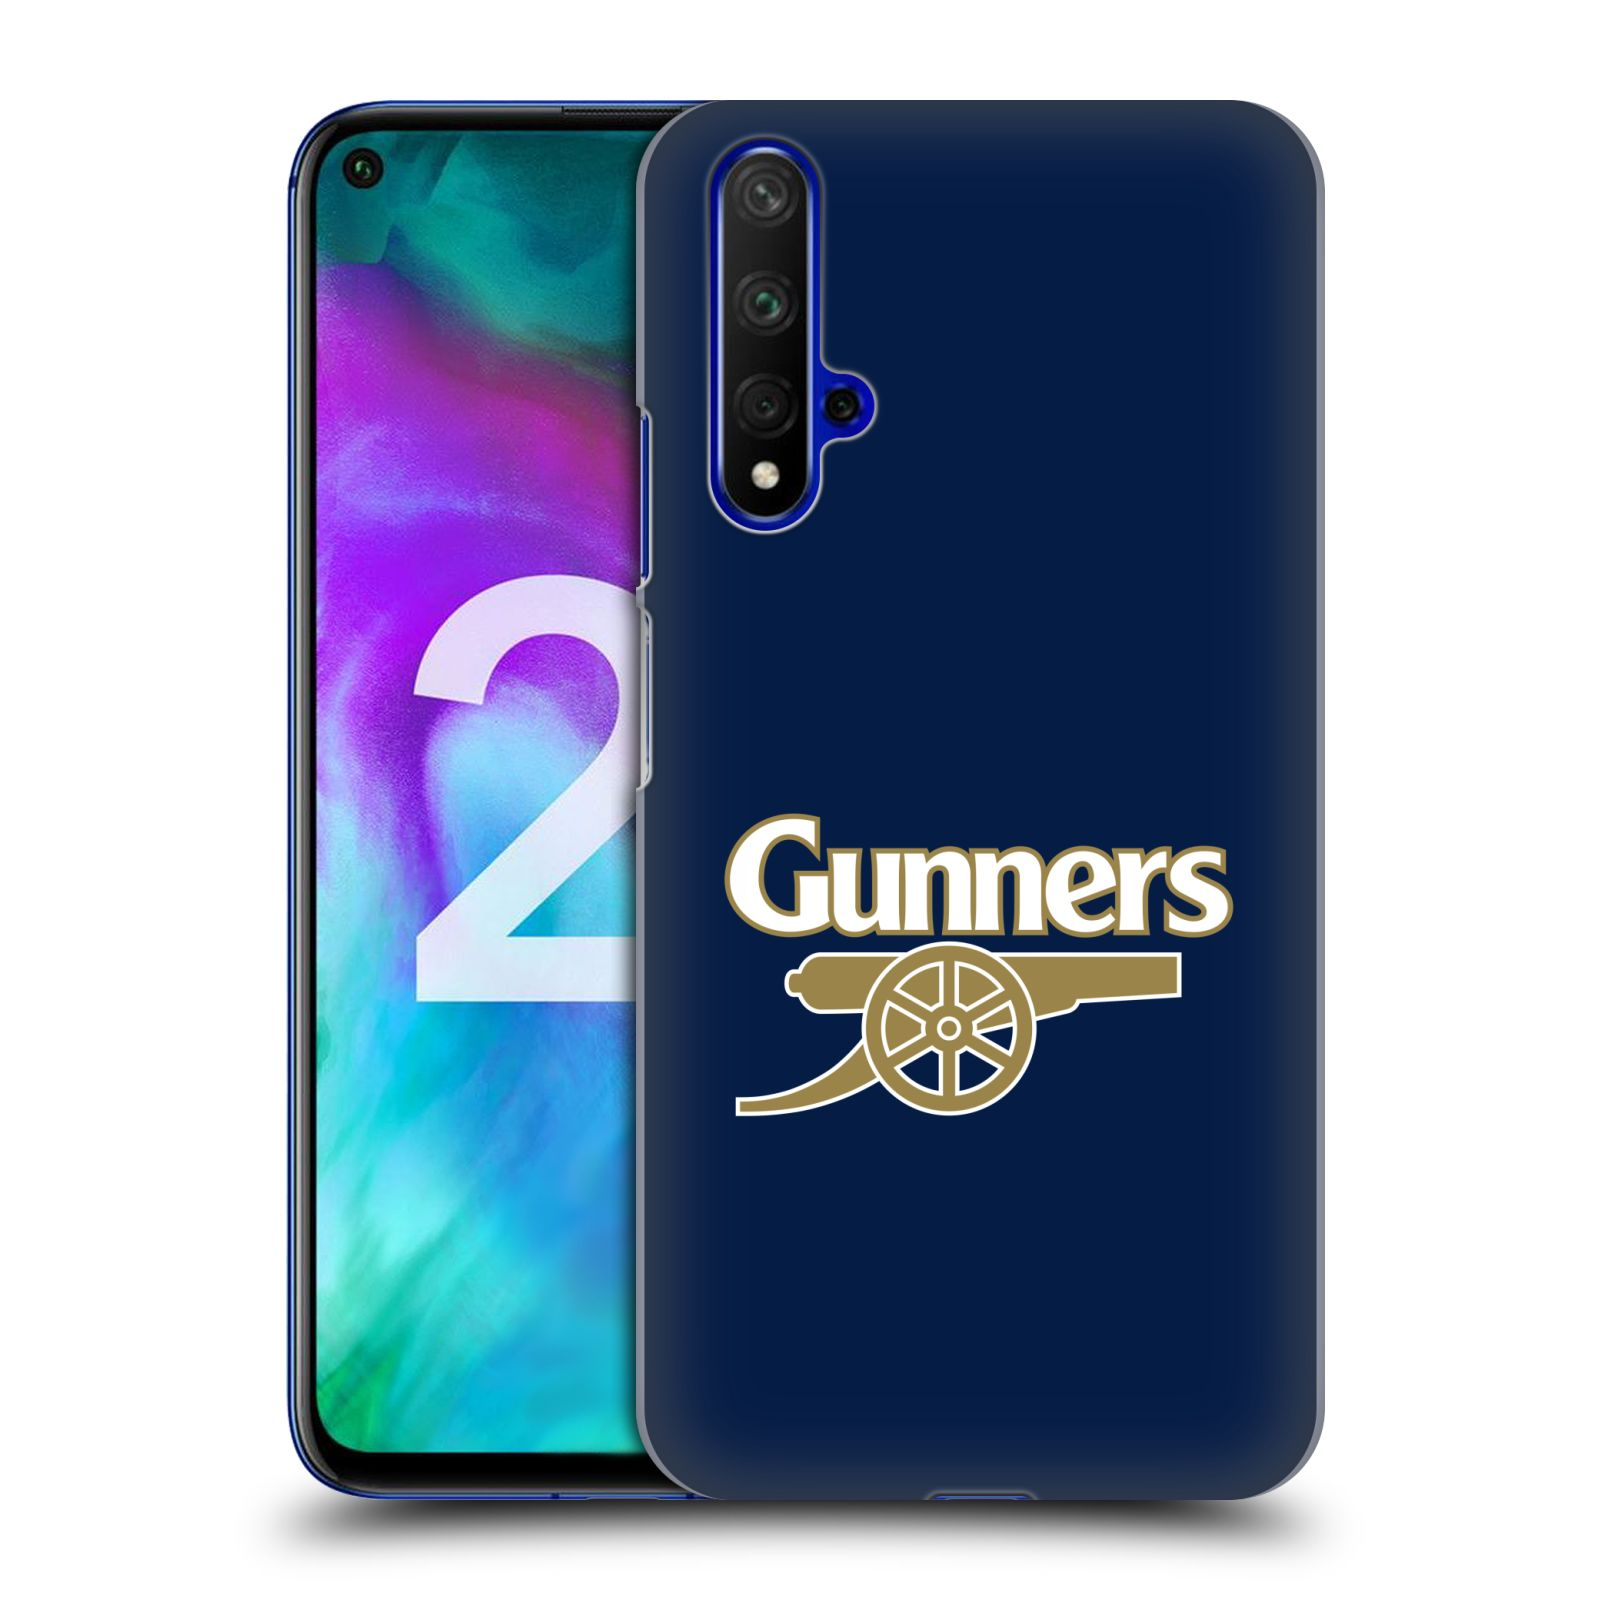 Plastové pouzdro na mobil Honor 20 - Head Case - Arsenal FC - Gunners